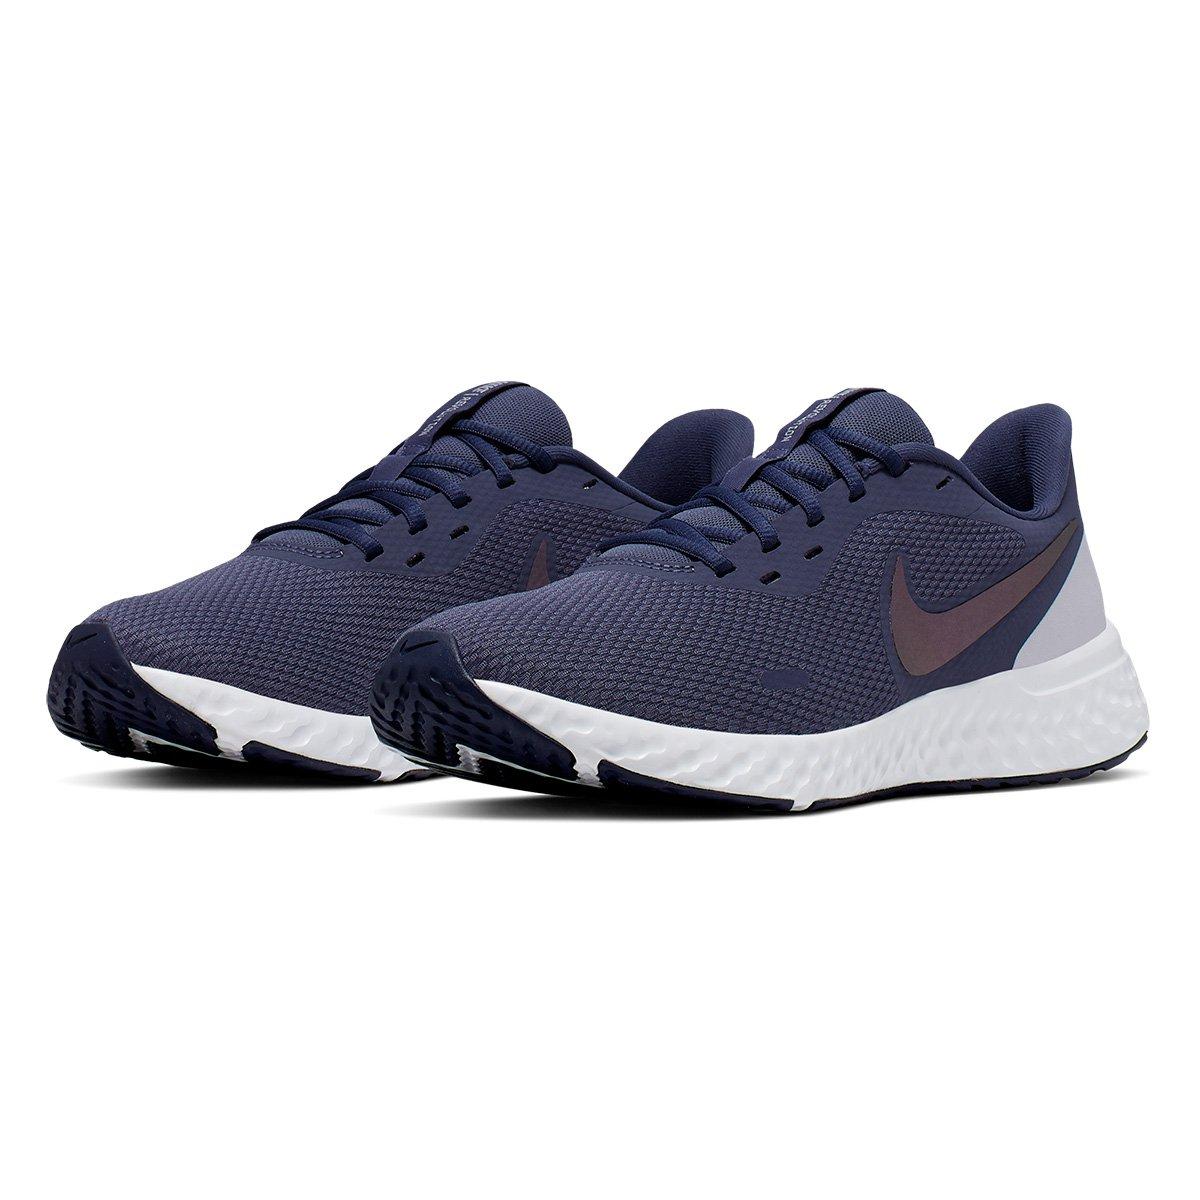 Tênis Nike Revolution 5 Feminino Lilás E Cinza